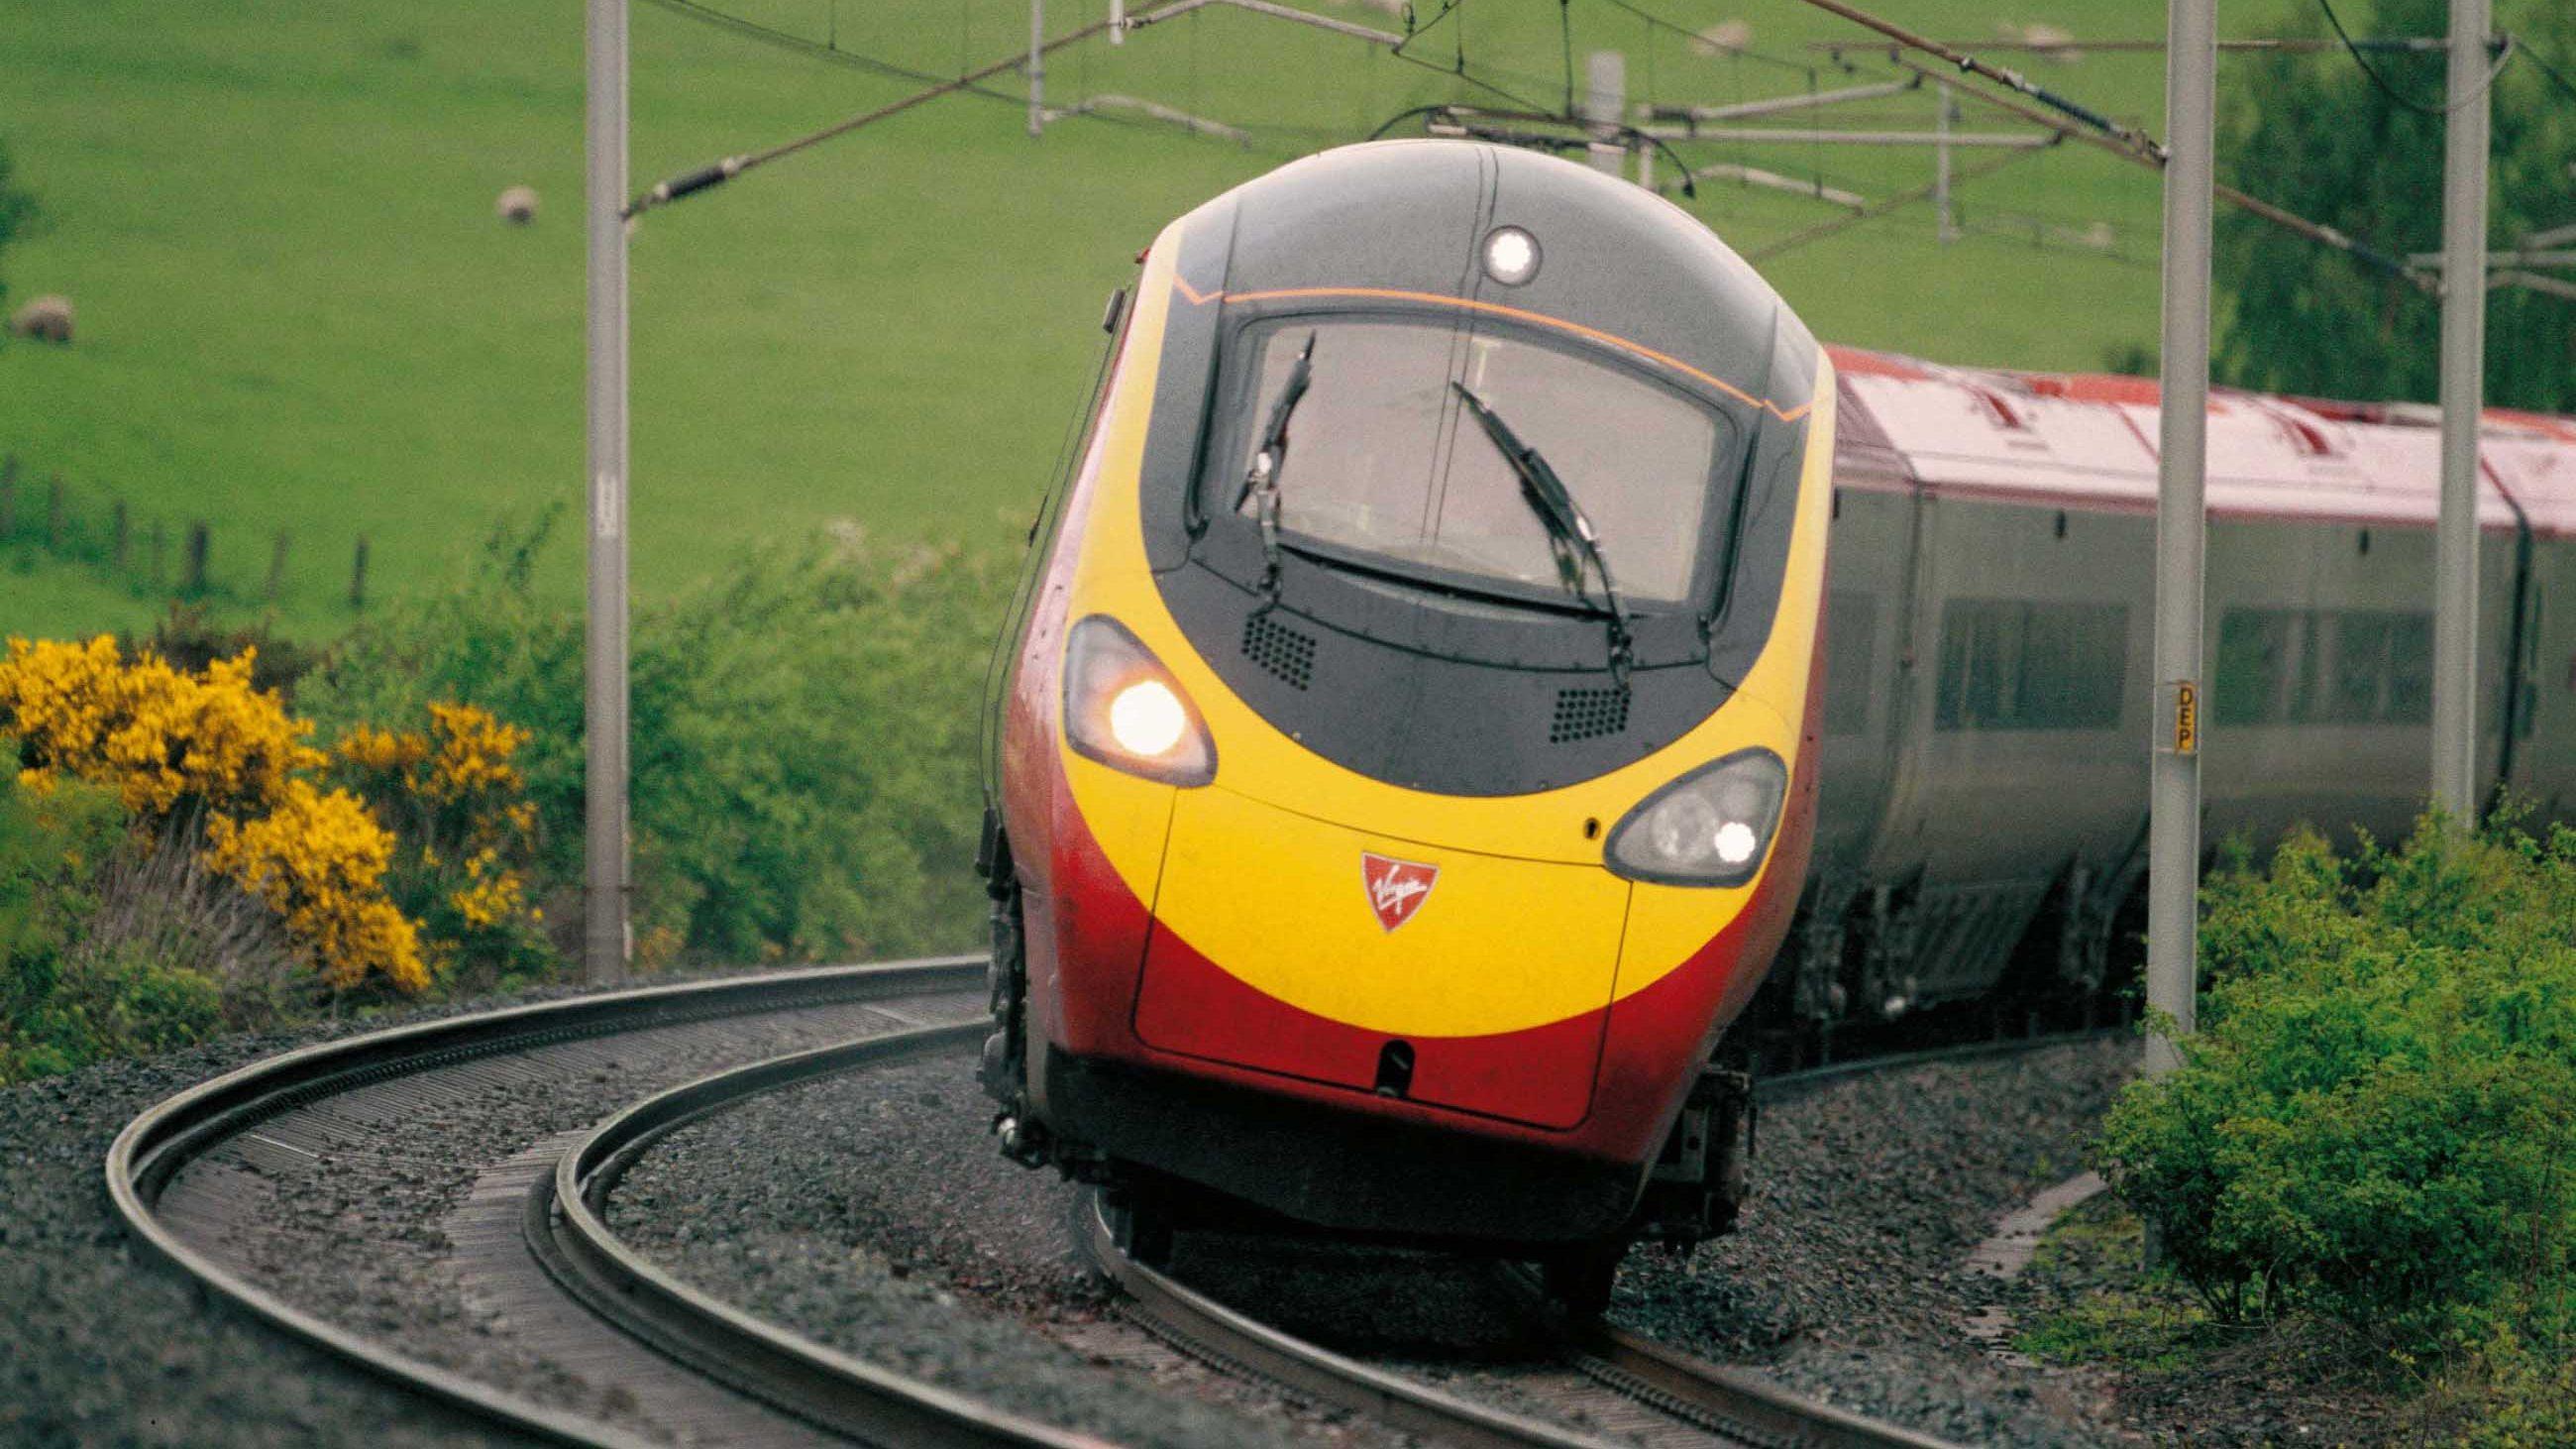 Virgin Pendolino tiliting around a curve // Credit: Virgin Trains